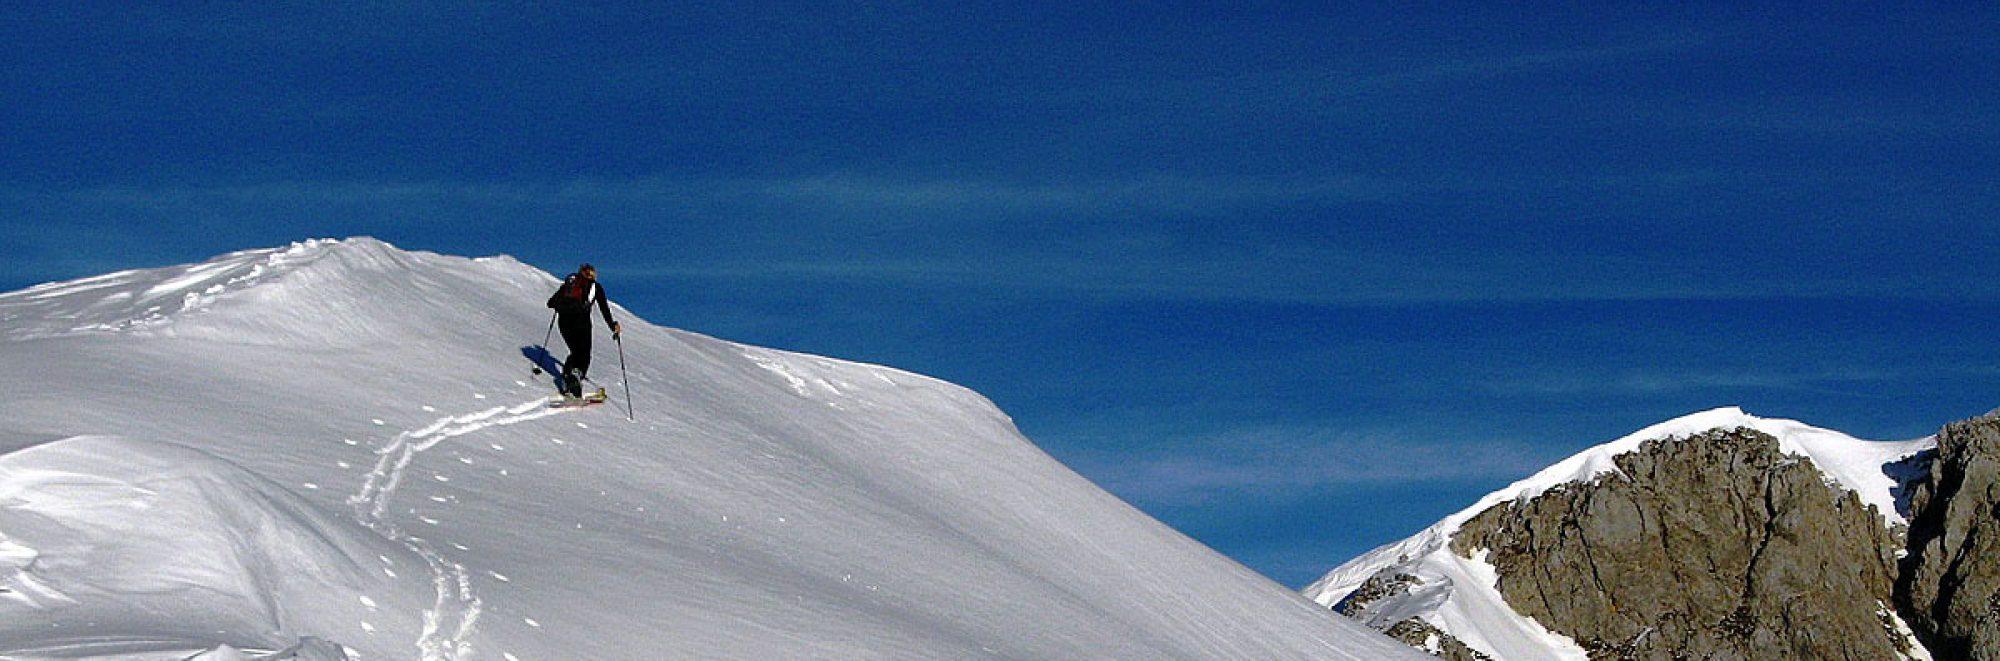 Tiroler Bergsportführerverband